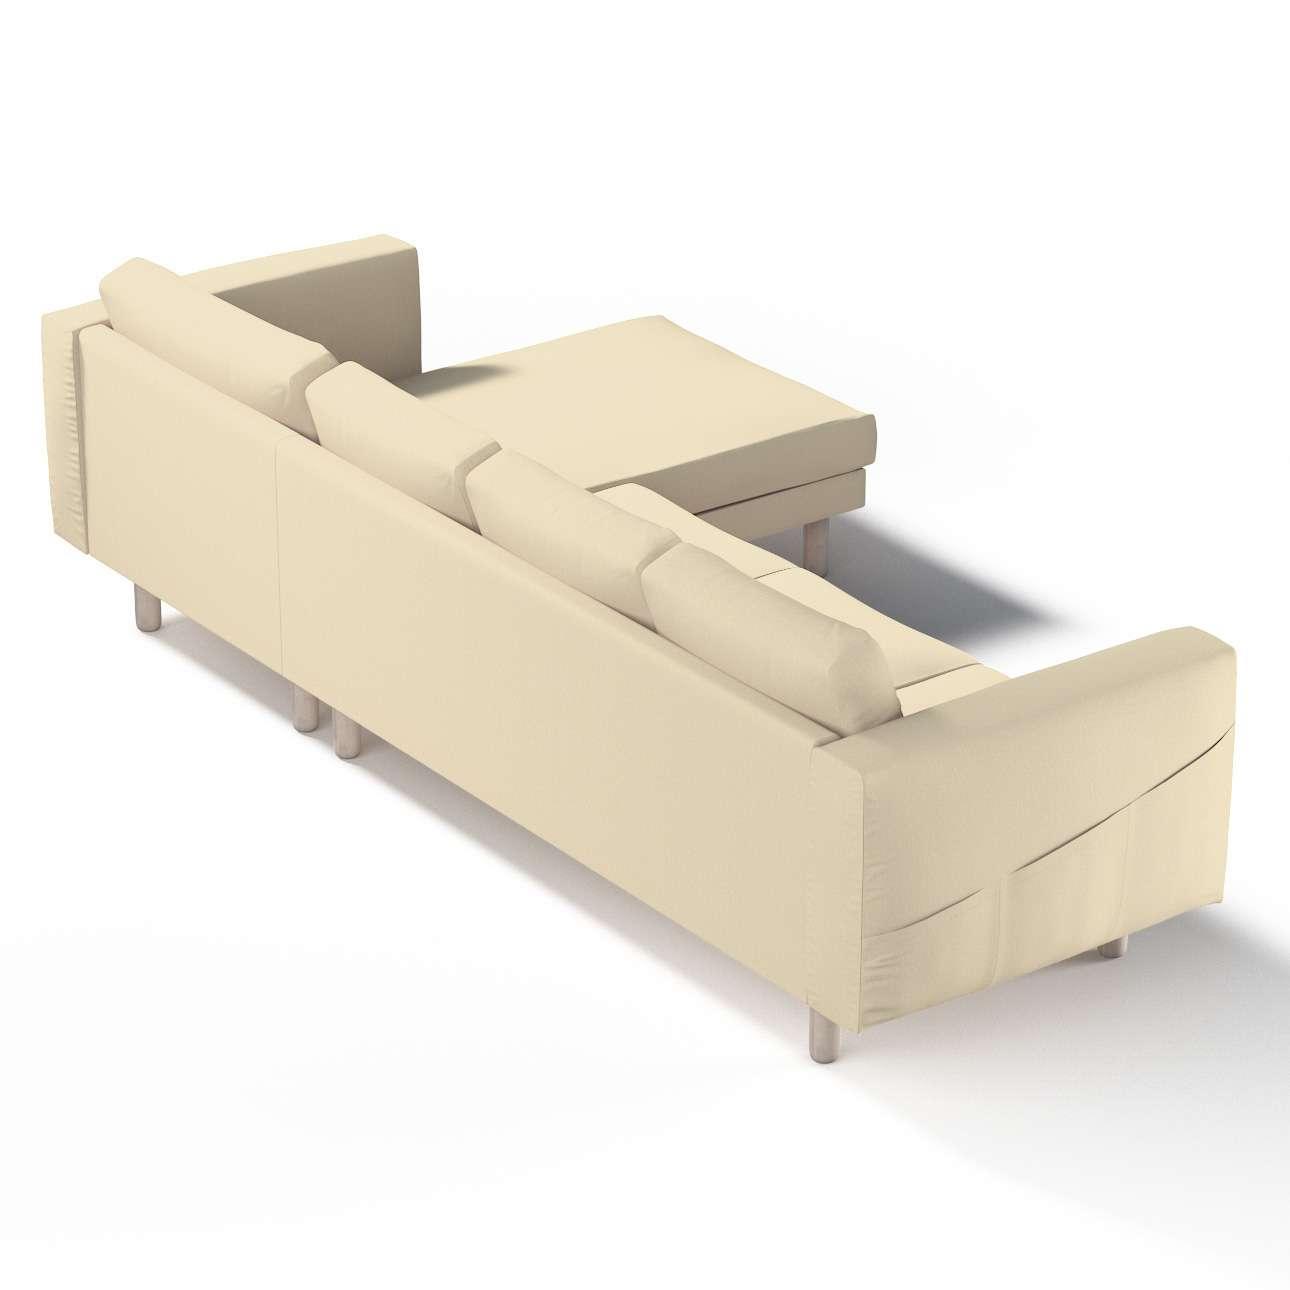 norsborg bezug f r 4 sitzer sofa mit recamiere vanille dekoria. Black Bedroom Furniture Sets. Home Design Ideas